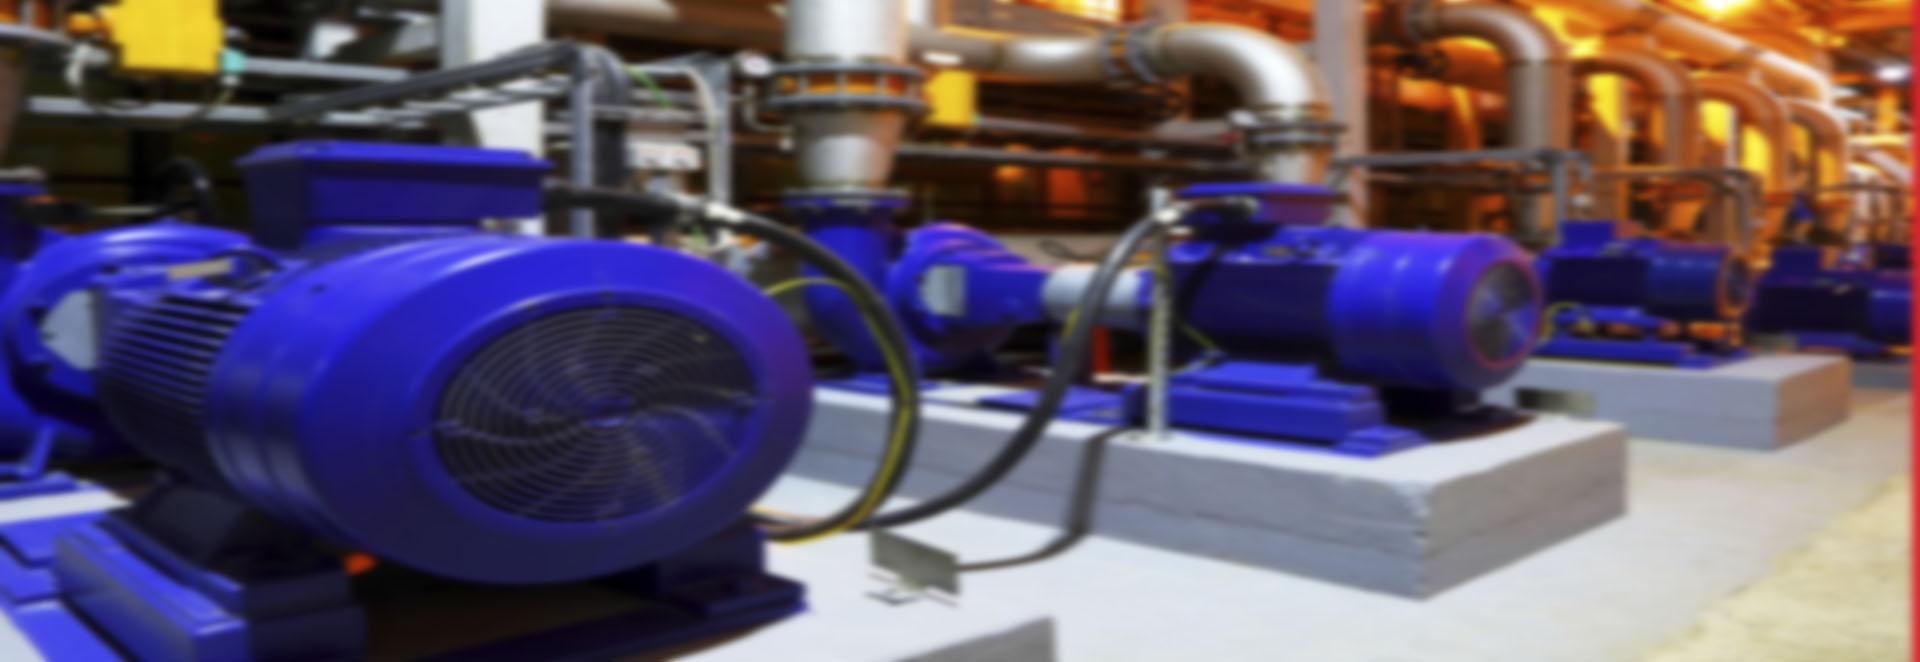 pump repair in seattle